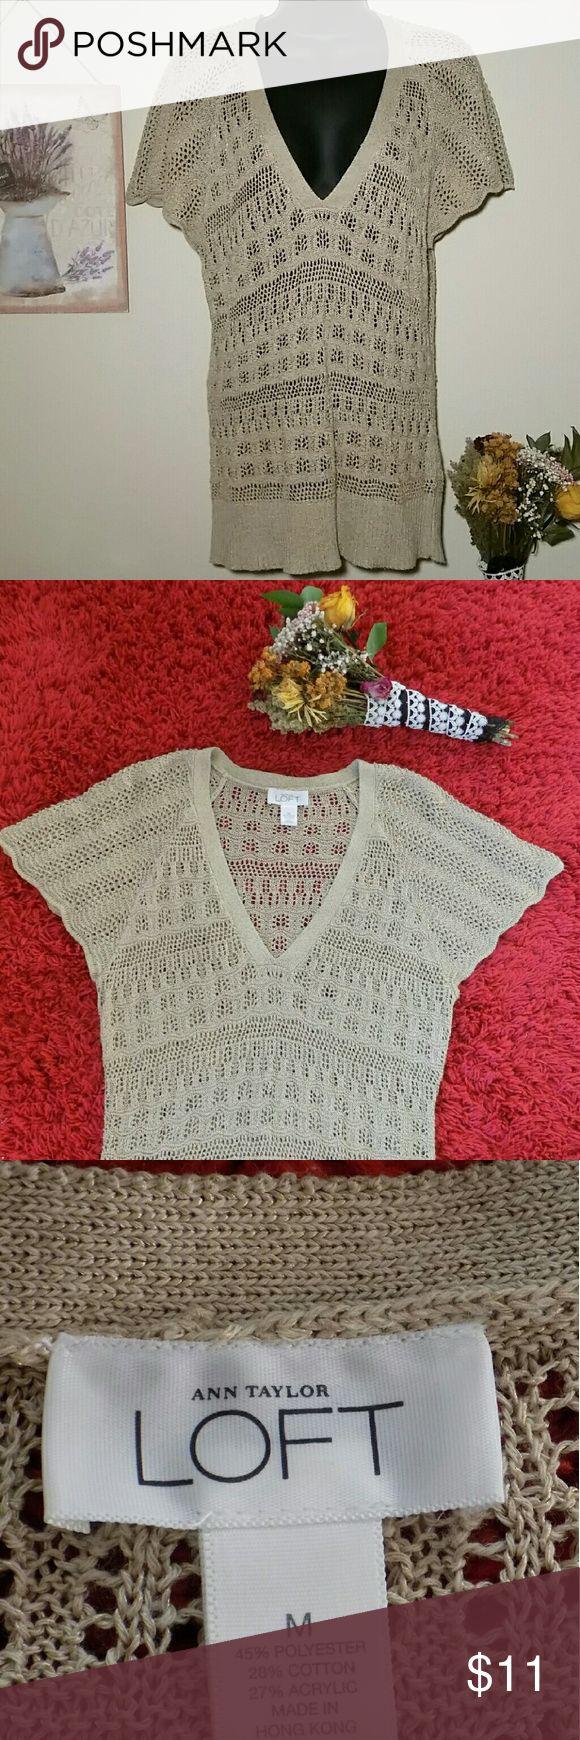 LOFT ANN TAYLOR SOFT SWEATER TOP 🌾 Super cute Croche sweater 🌾                   gently used condition 😊 45% polyester 28% cotton 27% acrylic 🌾 🚫smoke free home🚫  Muy bonito sueter de crochet🌾 Gentilmente usado😊 En muy buenas condiciones🌾 SOFT Sweaters V-Necks